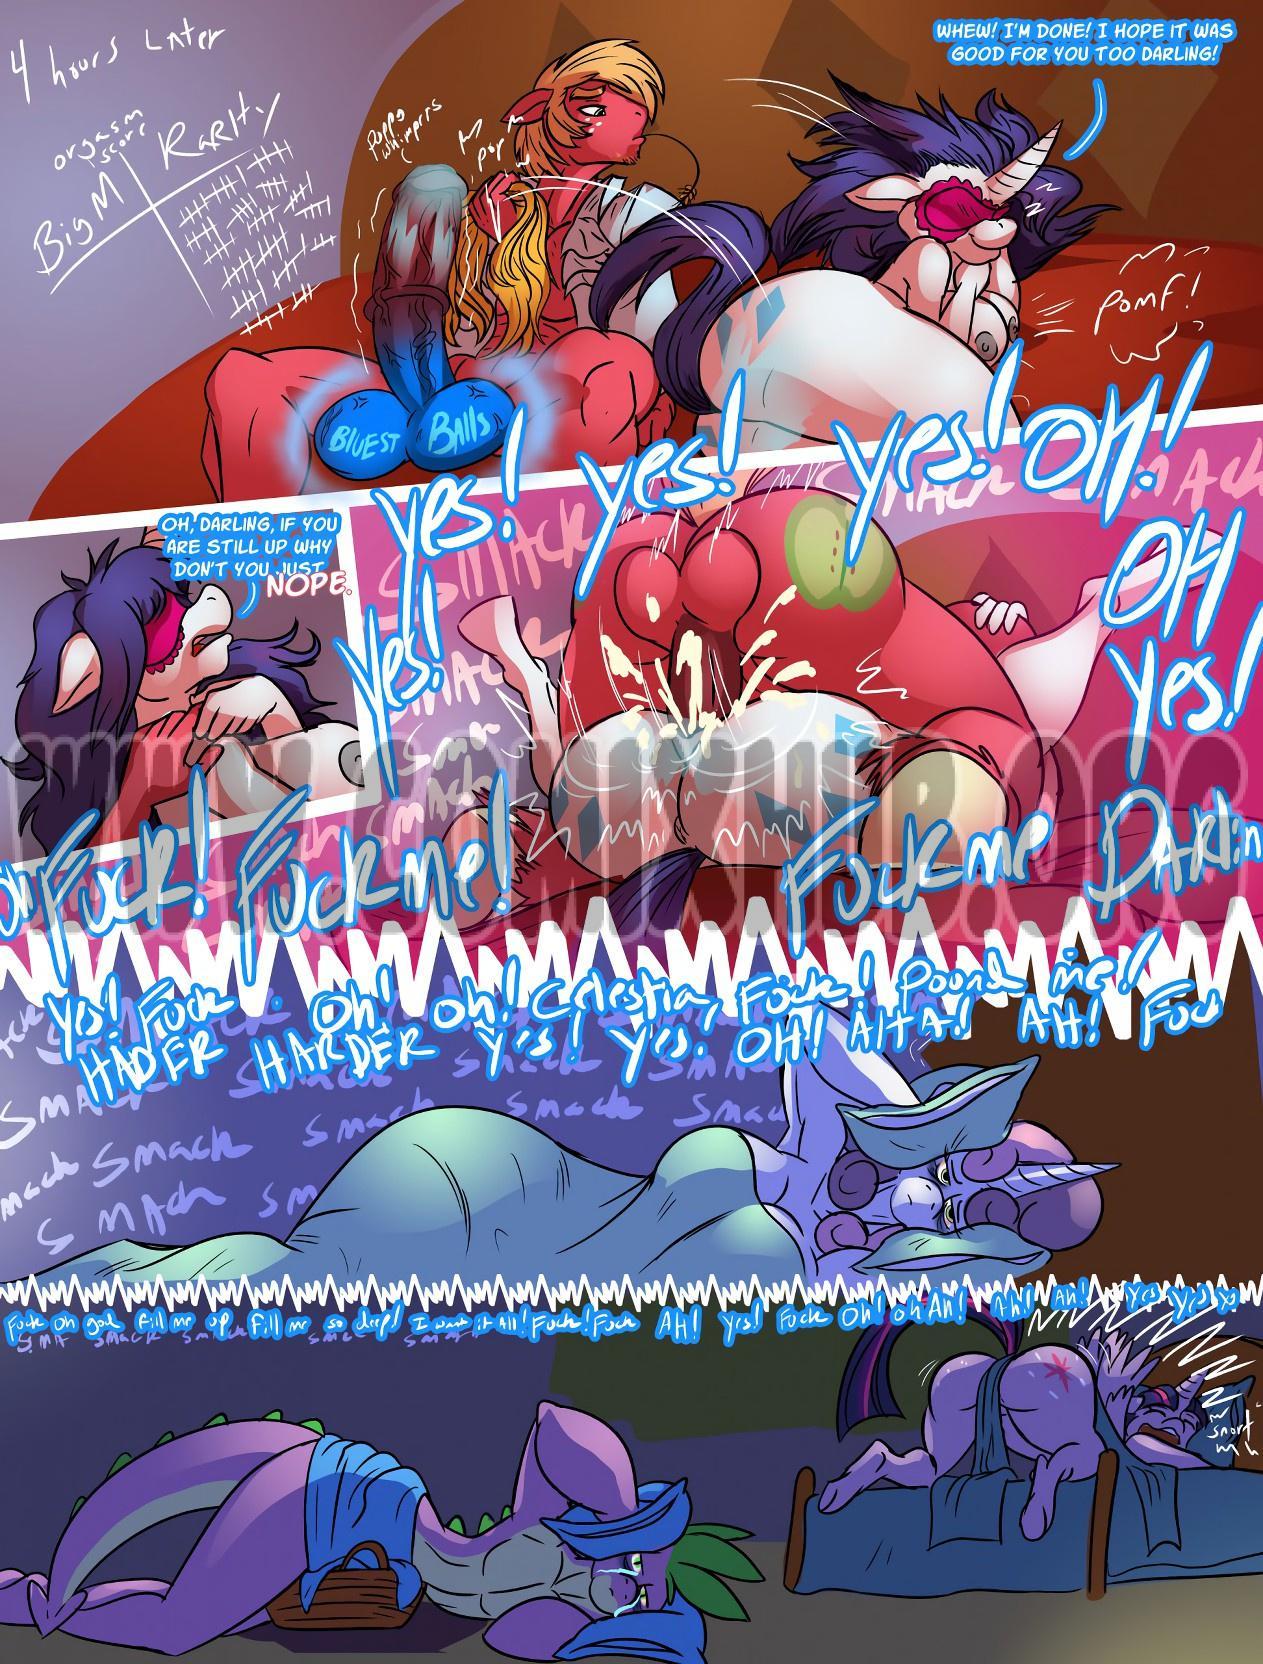 Big Mac Hindquarter Pounder porn comics Oral sex, Blowjob, Comedy, Creampie, Cum Swallow, Deepthroat, Glasses, Straight, X-Ray